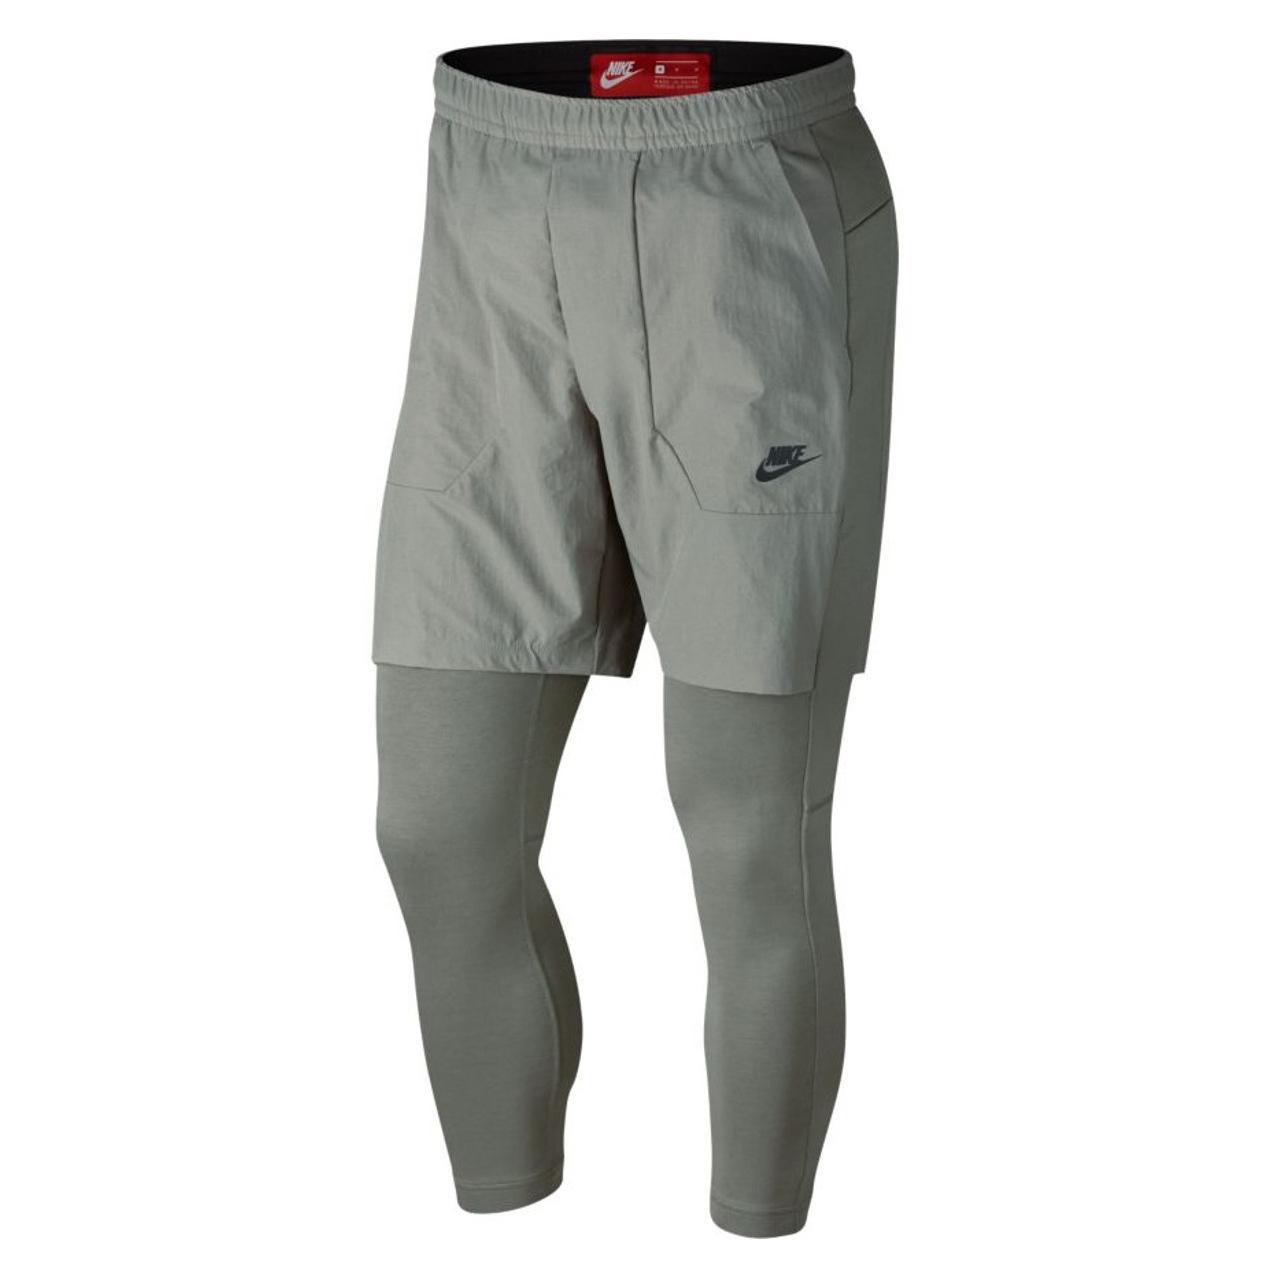 0e40a54ebf62 Nike Tech Fleece 2in1 Pants - SPORTING GOODS Sports Pants - Superfanas.lt